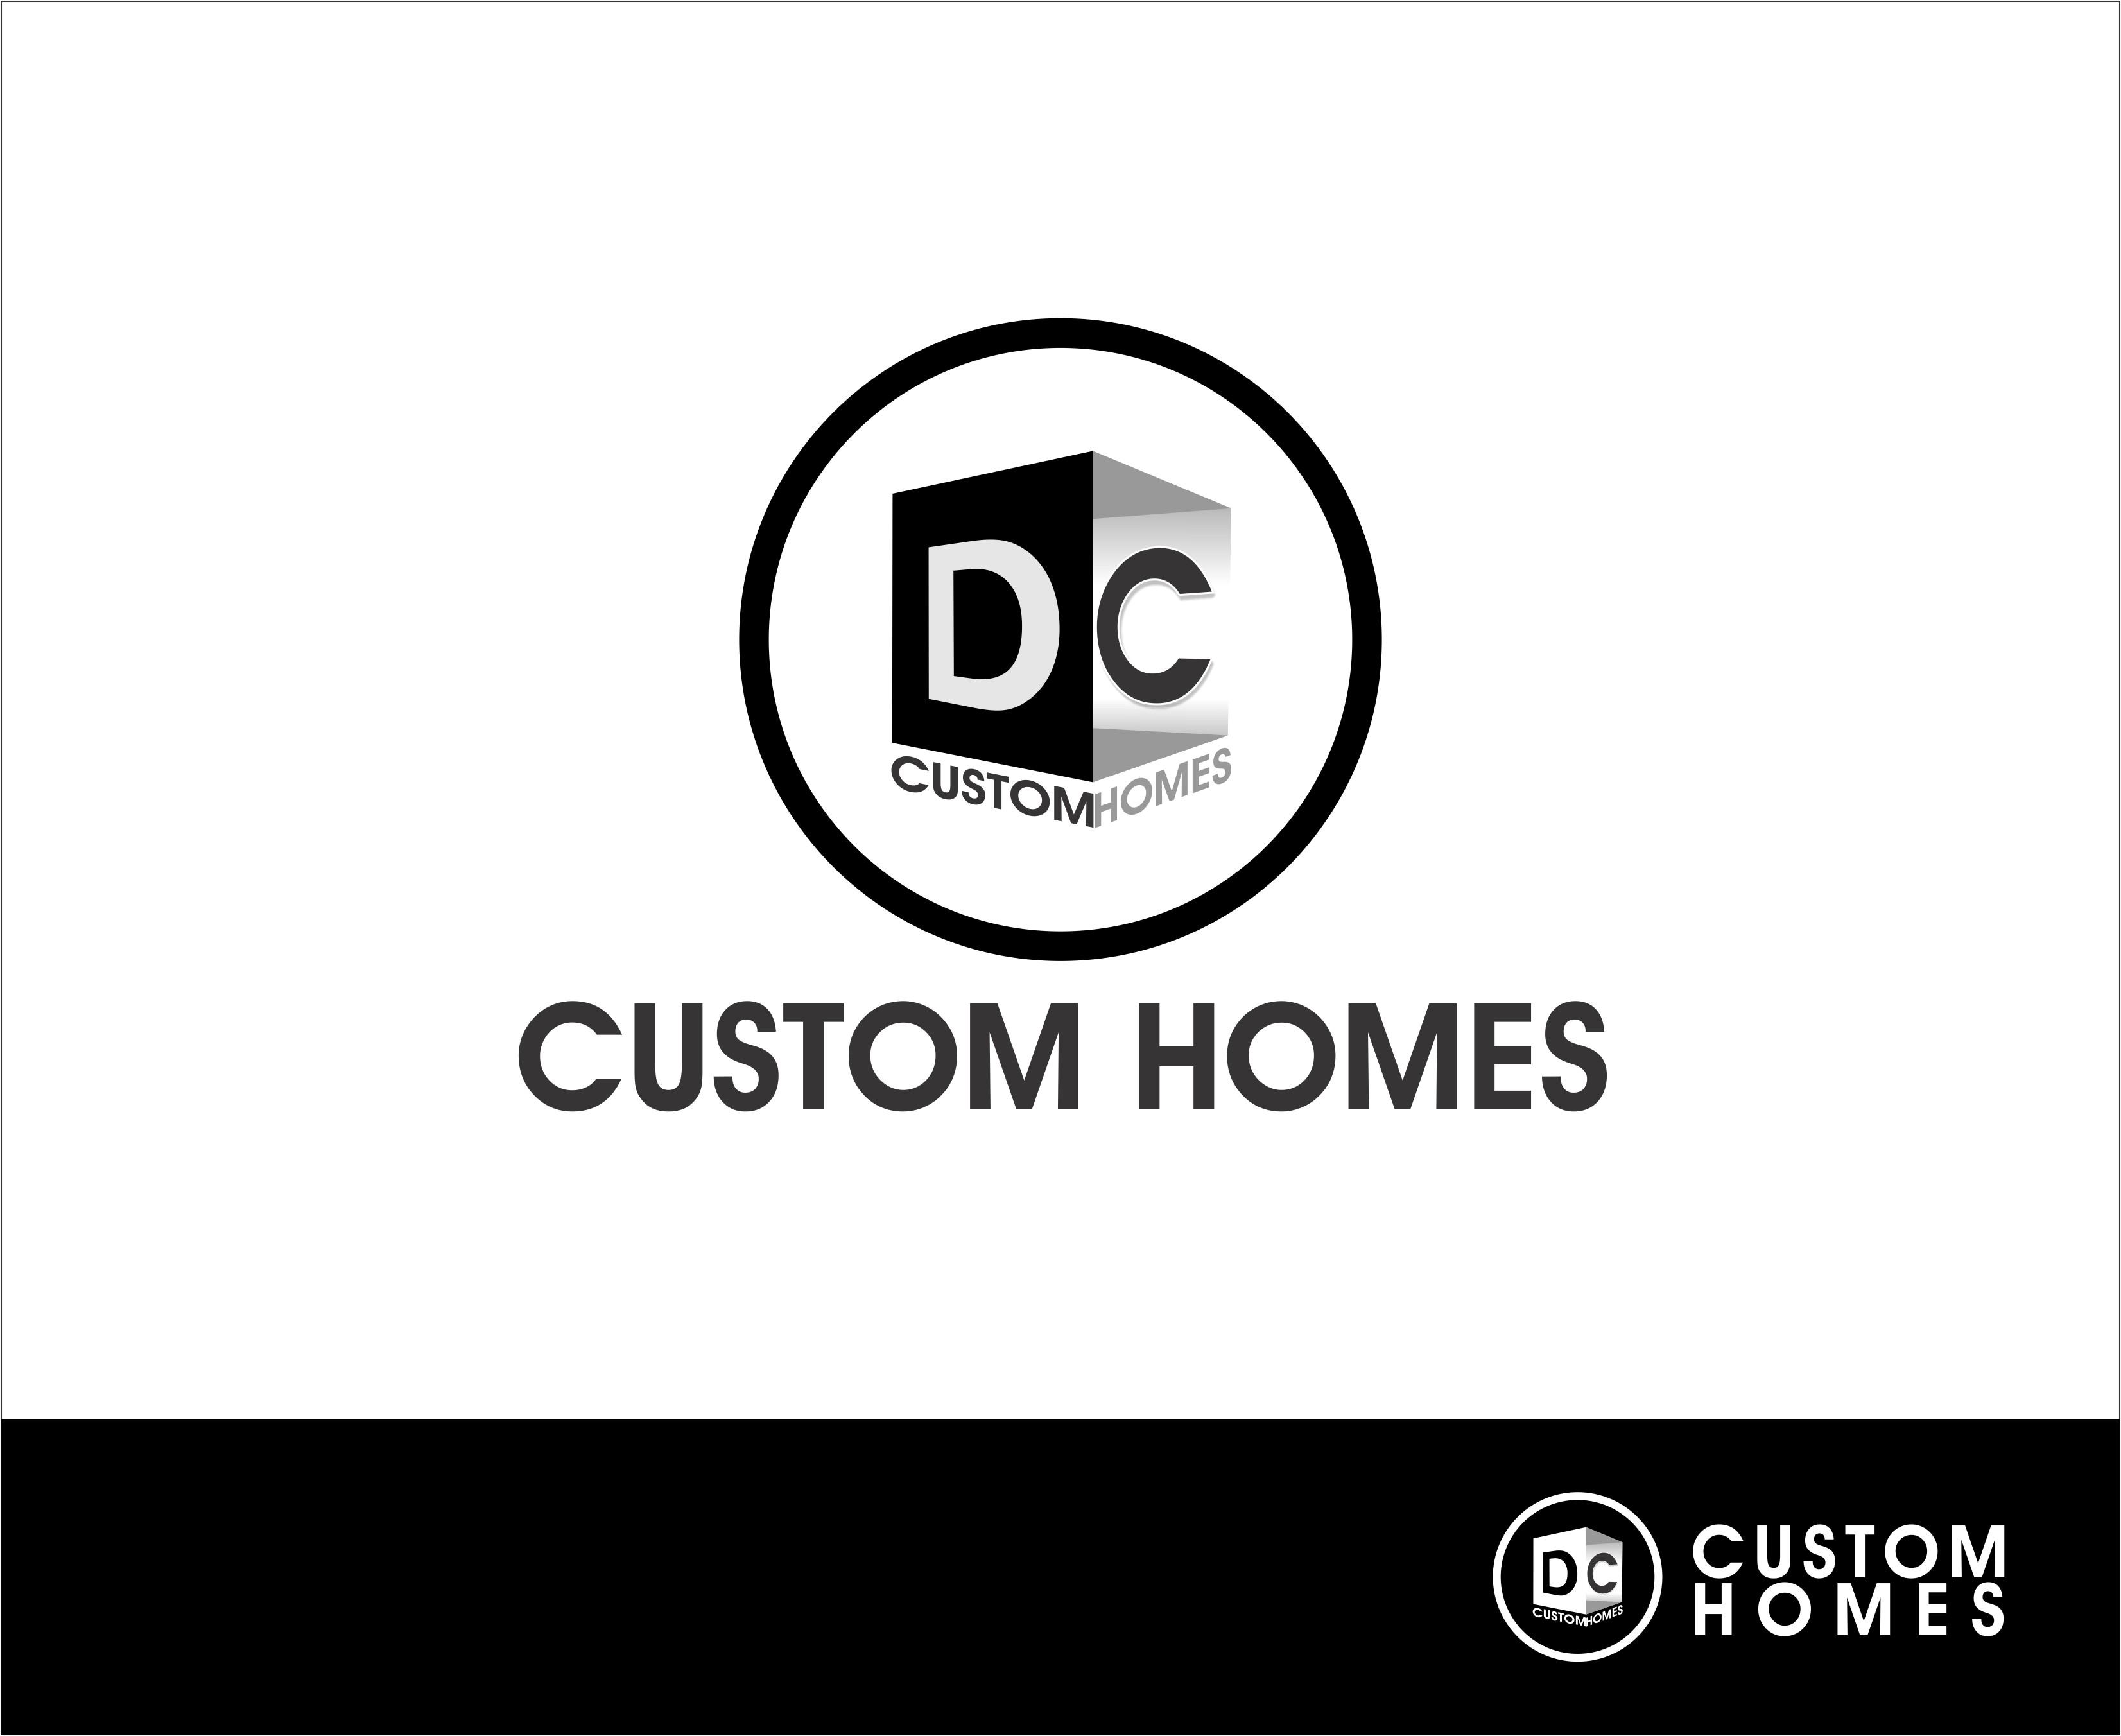 Logo Design by Mhon_Rose - Entry No. 224 in the Logo Design Contest Creative Logo Design for DC Custom Homes.